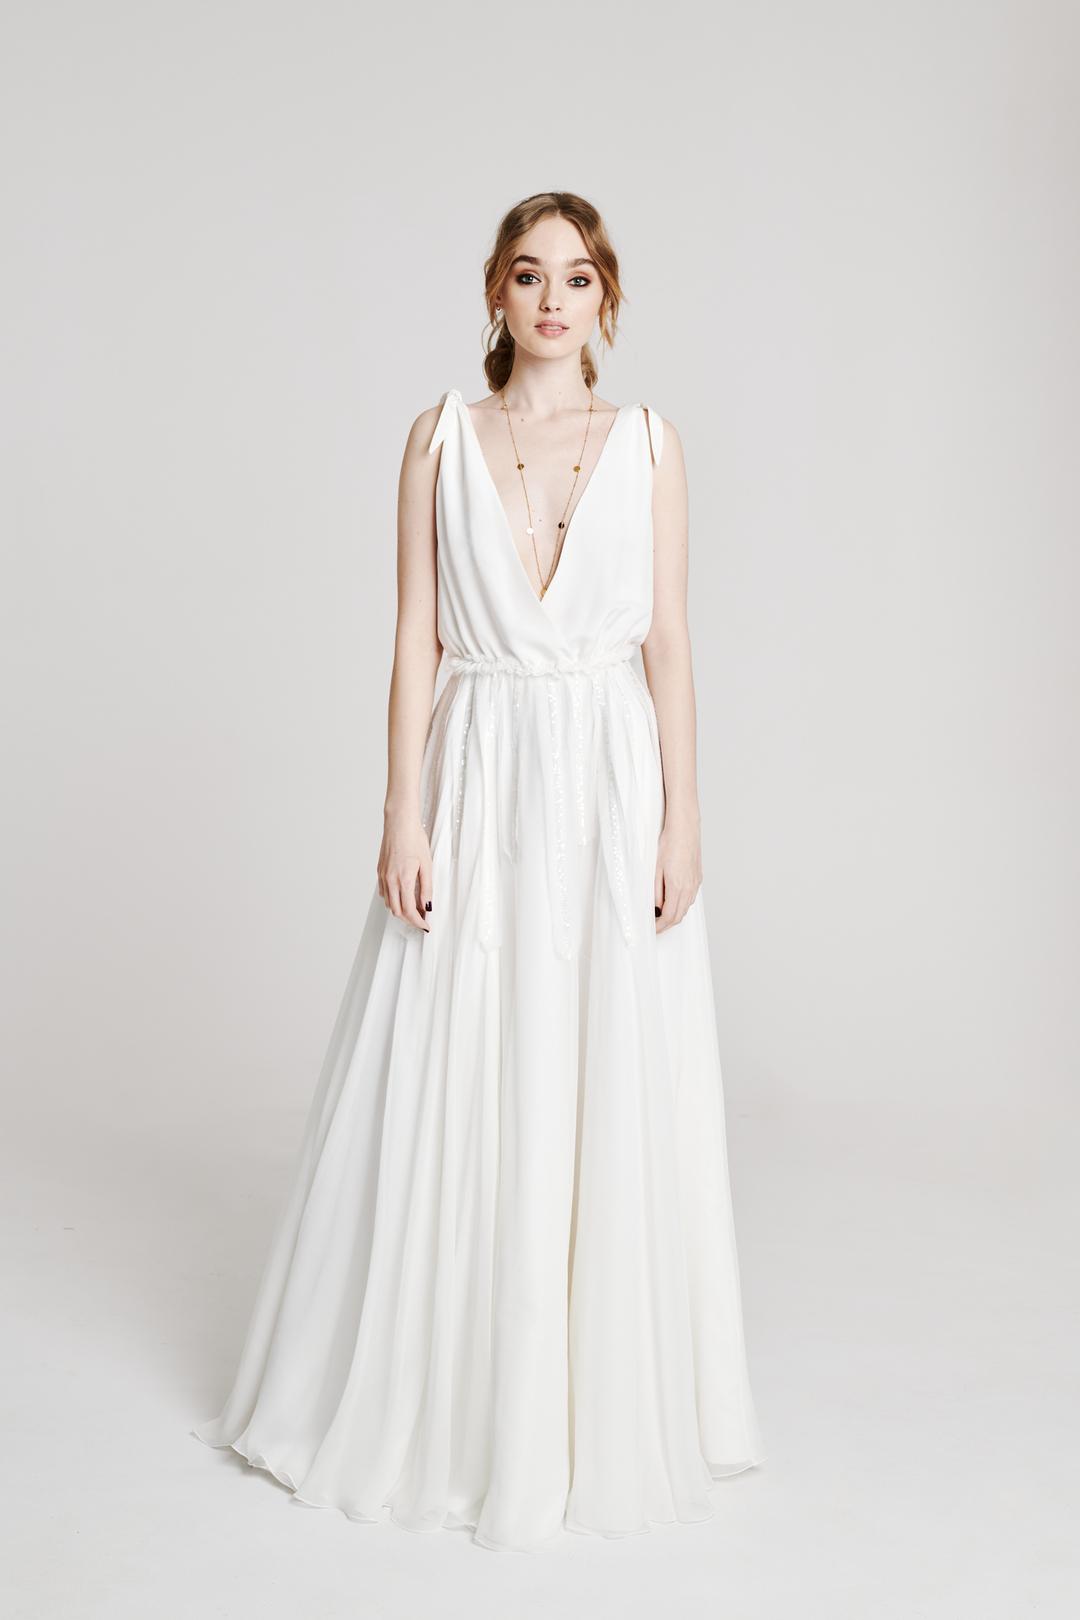 be spectacular dress photo